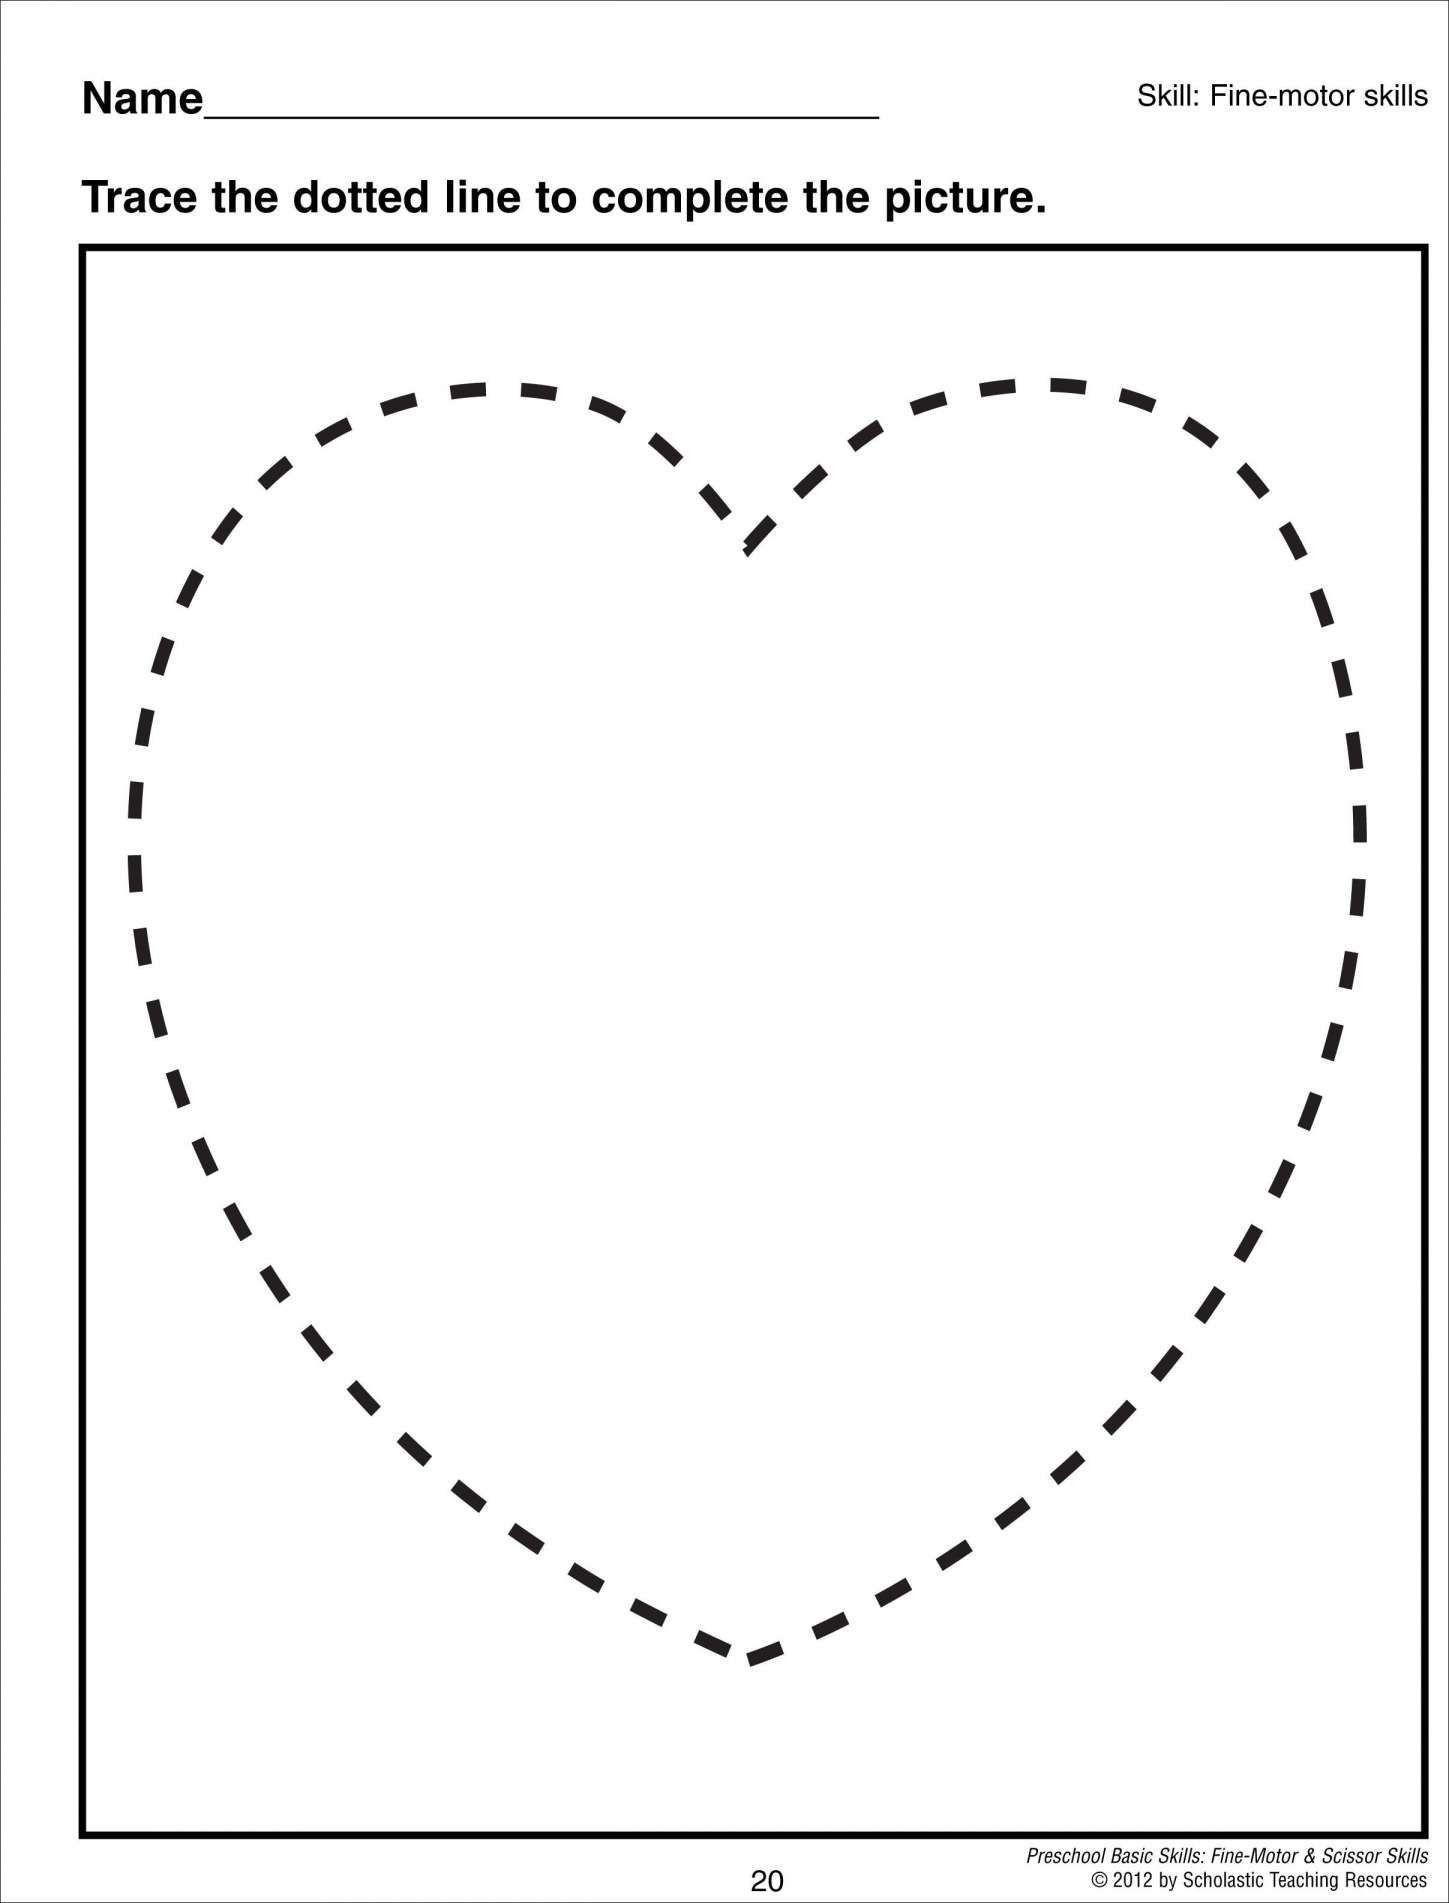 Heart Shape Worksheets For Preschoolers 9 Preschool Worksheet For Shape Heart Preschool In 2021 Shape Tracing Worksheets Shapes Worksheets Shapes Preschool [ 1903 x 1449 Pixel ]